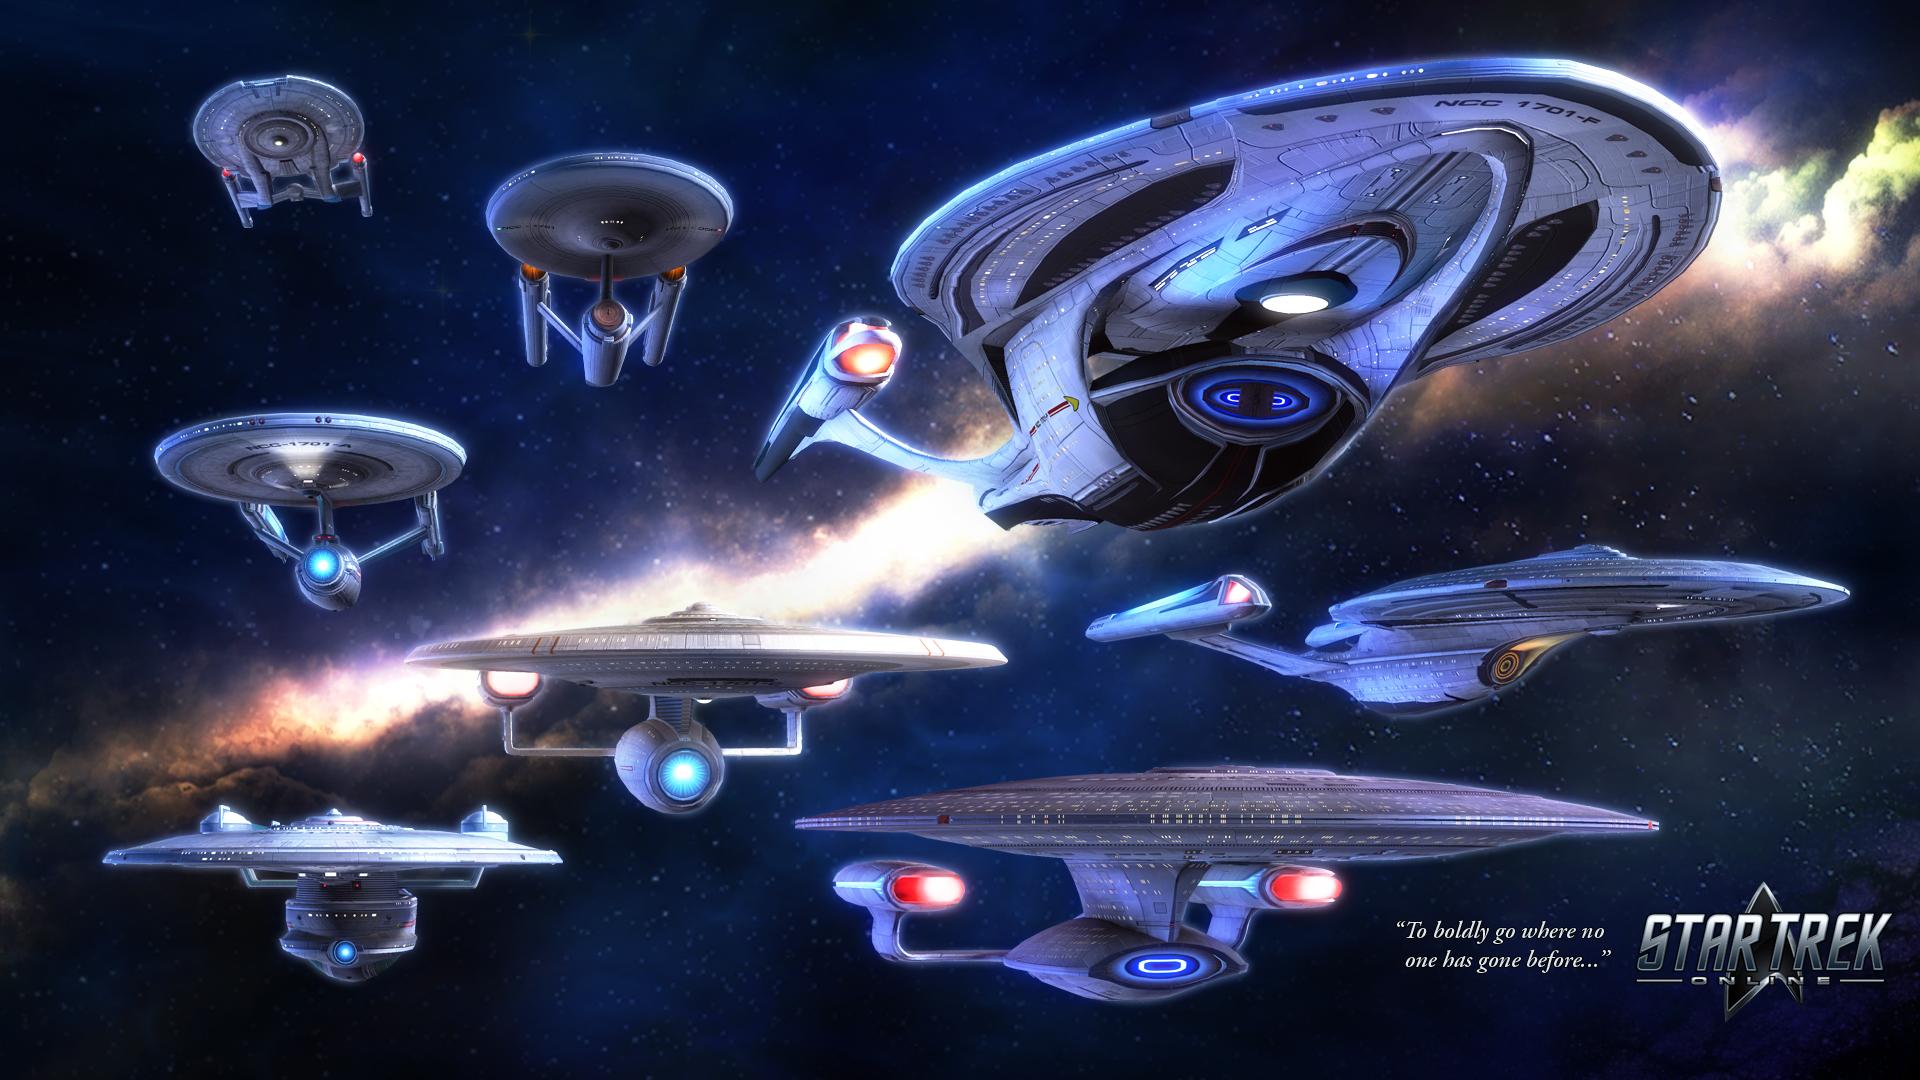 Star Trek Enterprise Ship wallpaper   911041 1920x1080